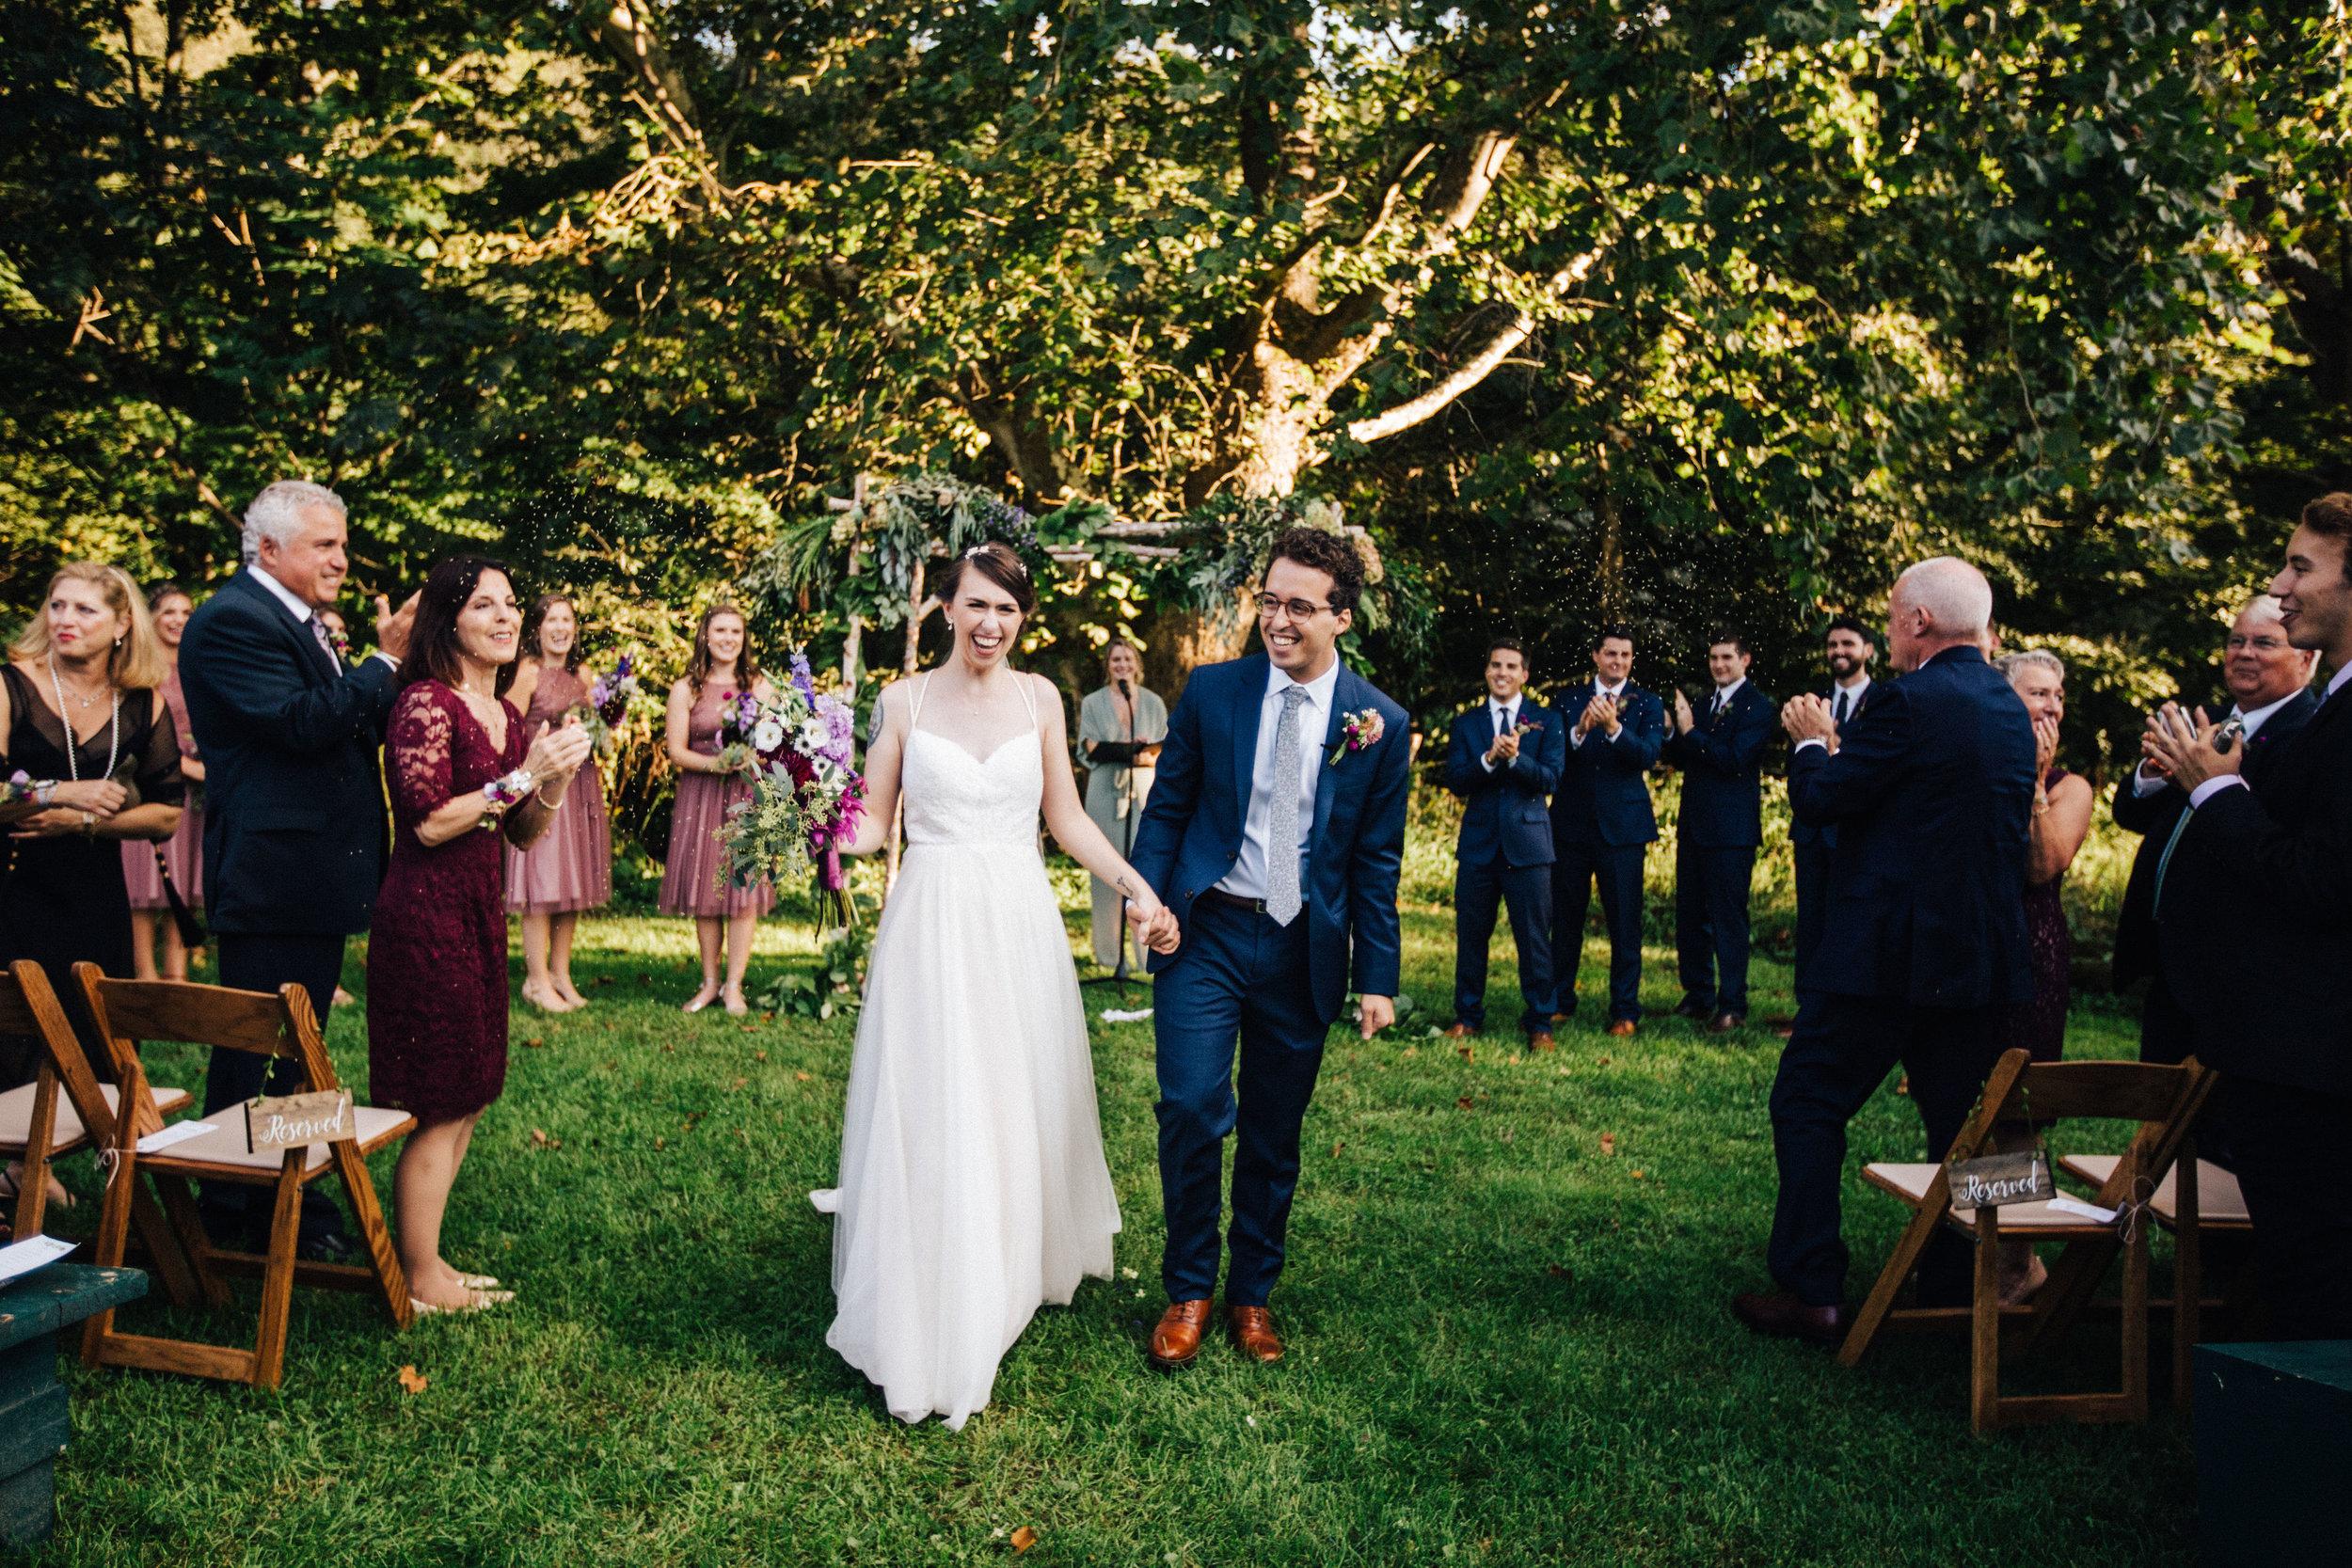 0692_Meghan+Nathan_Ceremony_JHuarteforCoupleofDudes.jpg